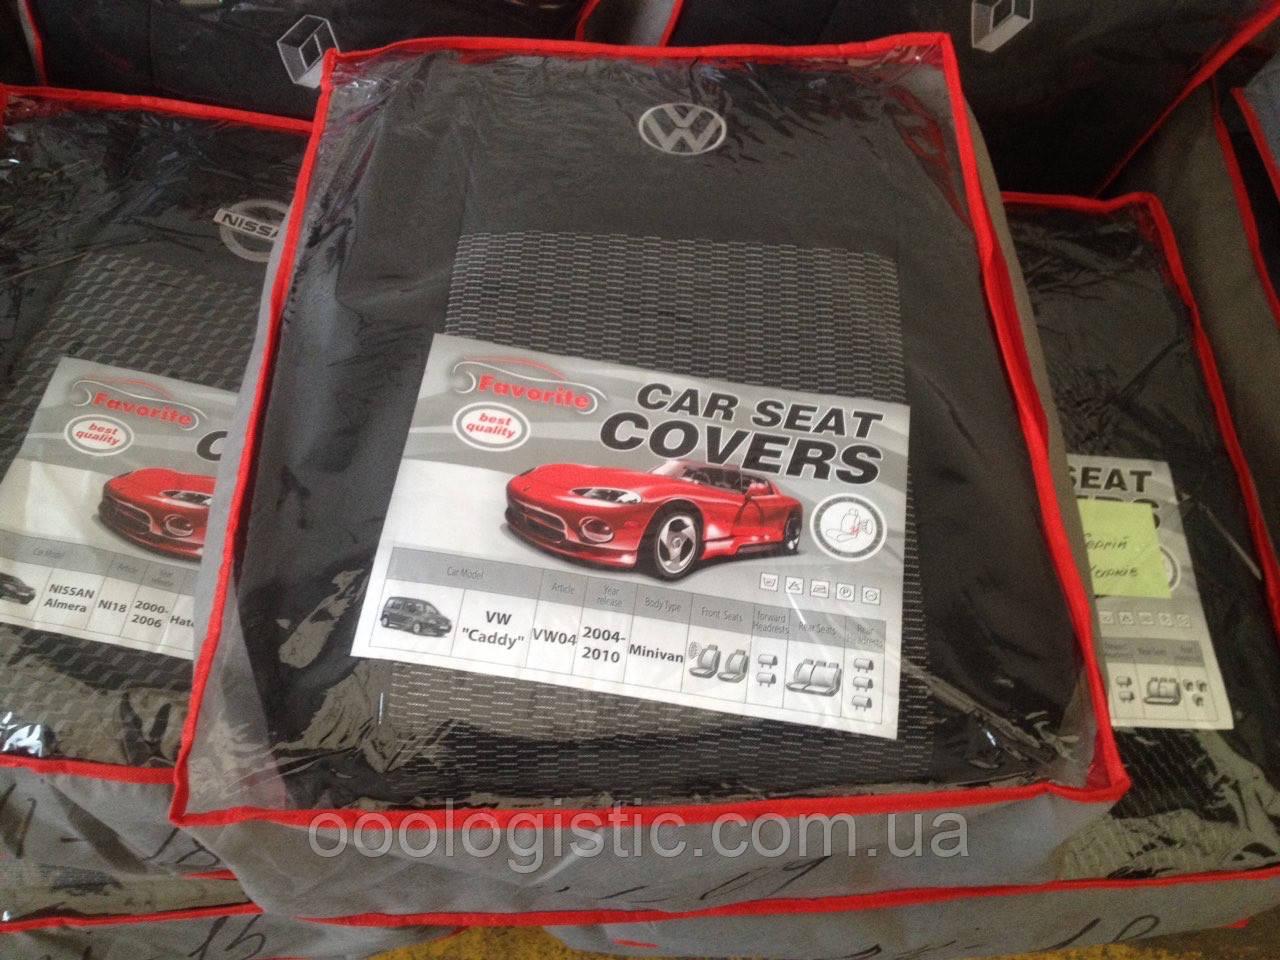 Авточехлы Favorite на Volkswagen Caddy 2004-2010 minivan,Фольксваген Кадди